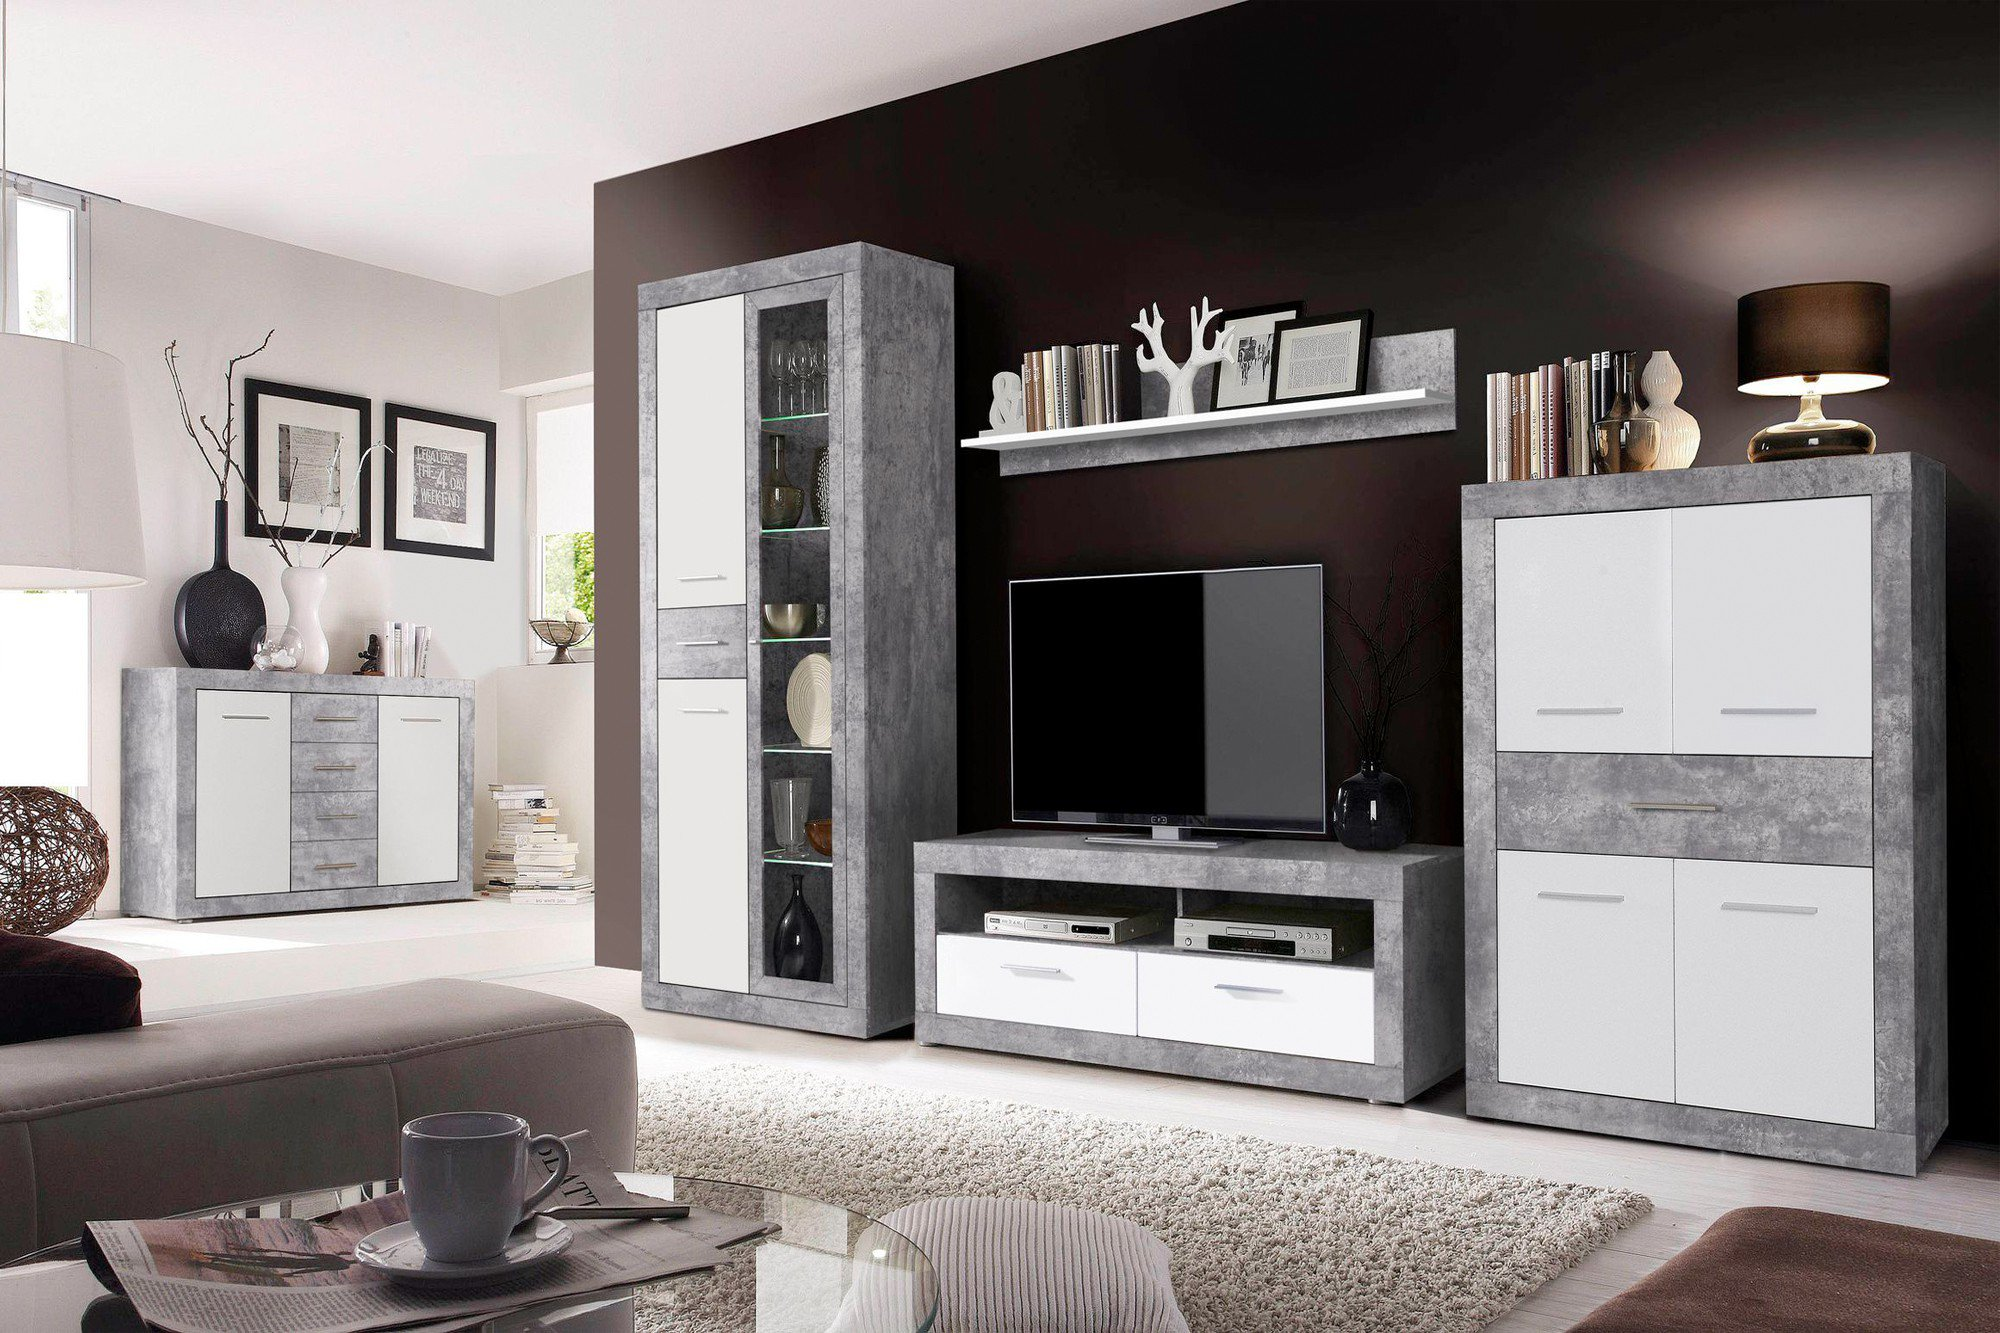 wohnwand vitus betonoptik lichtgrau von forte m bel letz. Black Bedroom Furniture Sets. Home Design Ideas